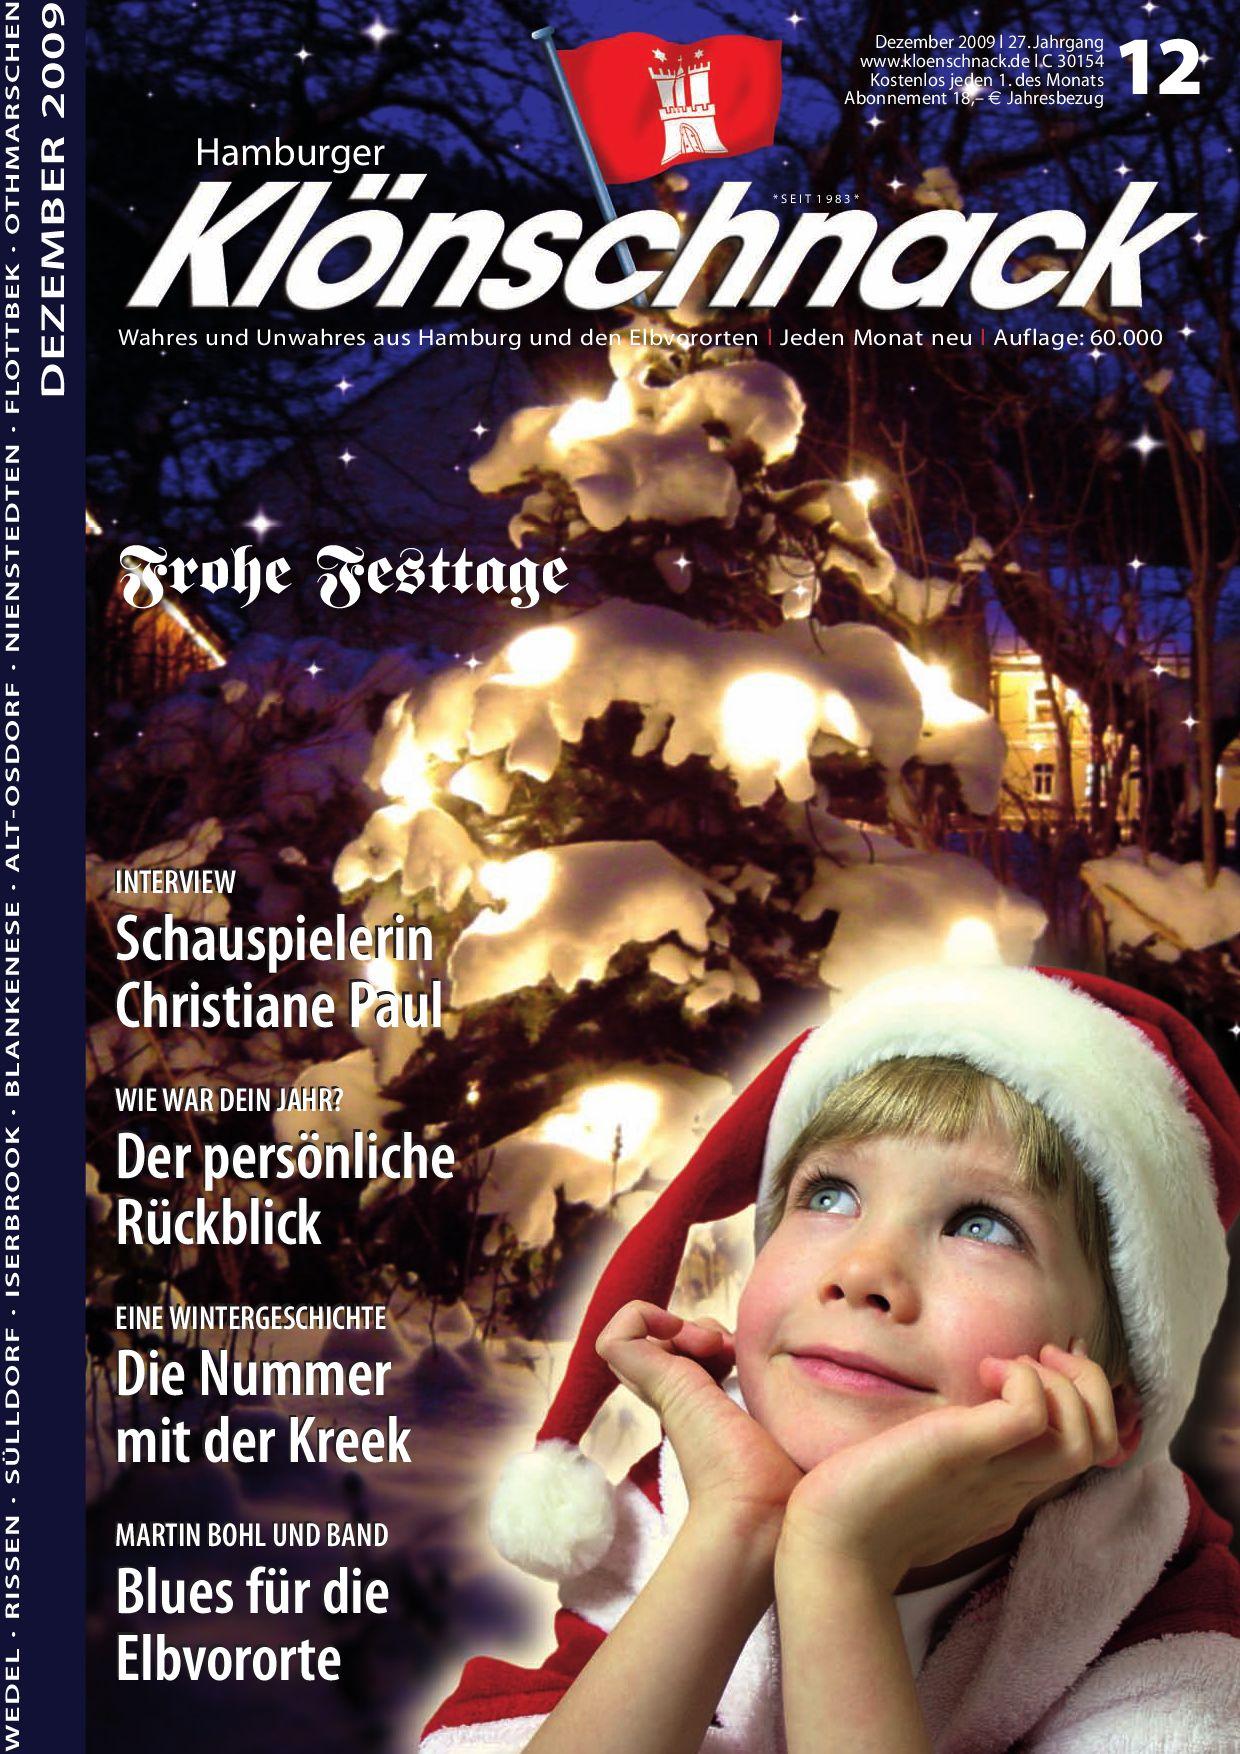 Hamburger Klönschnack - Dezember \'09 by Hamburger Klönschnack - issuu